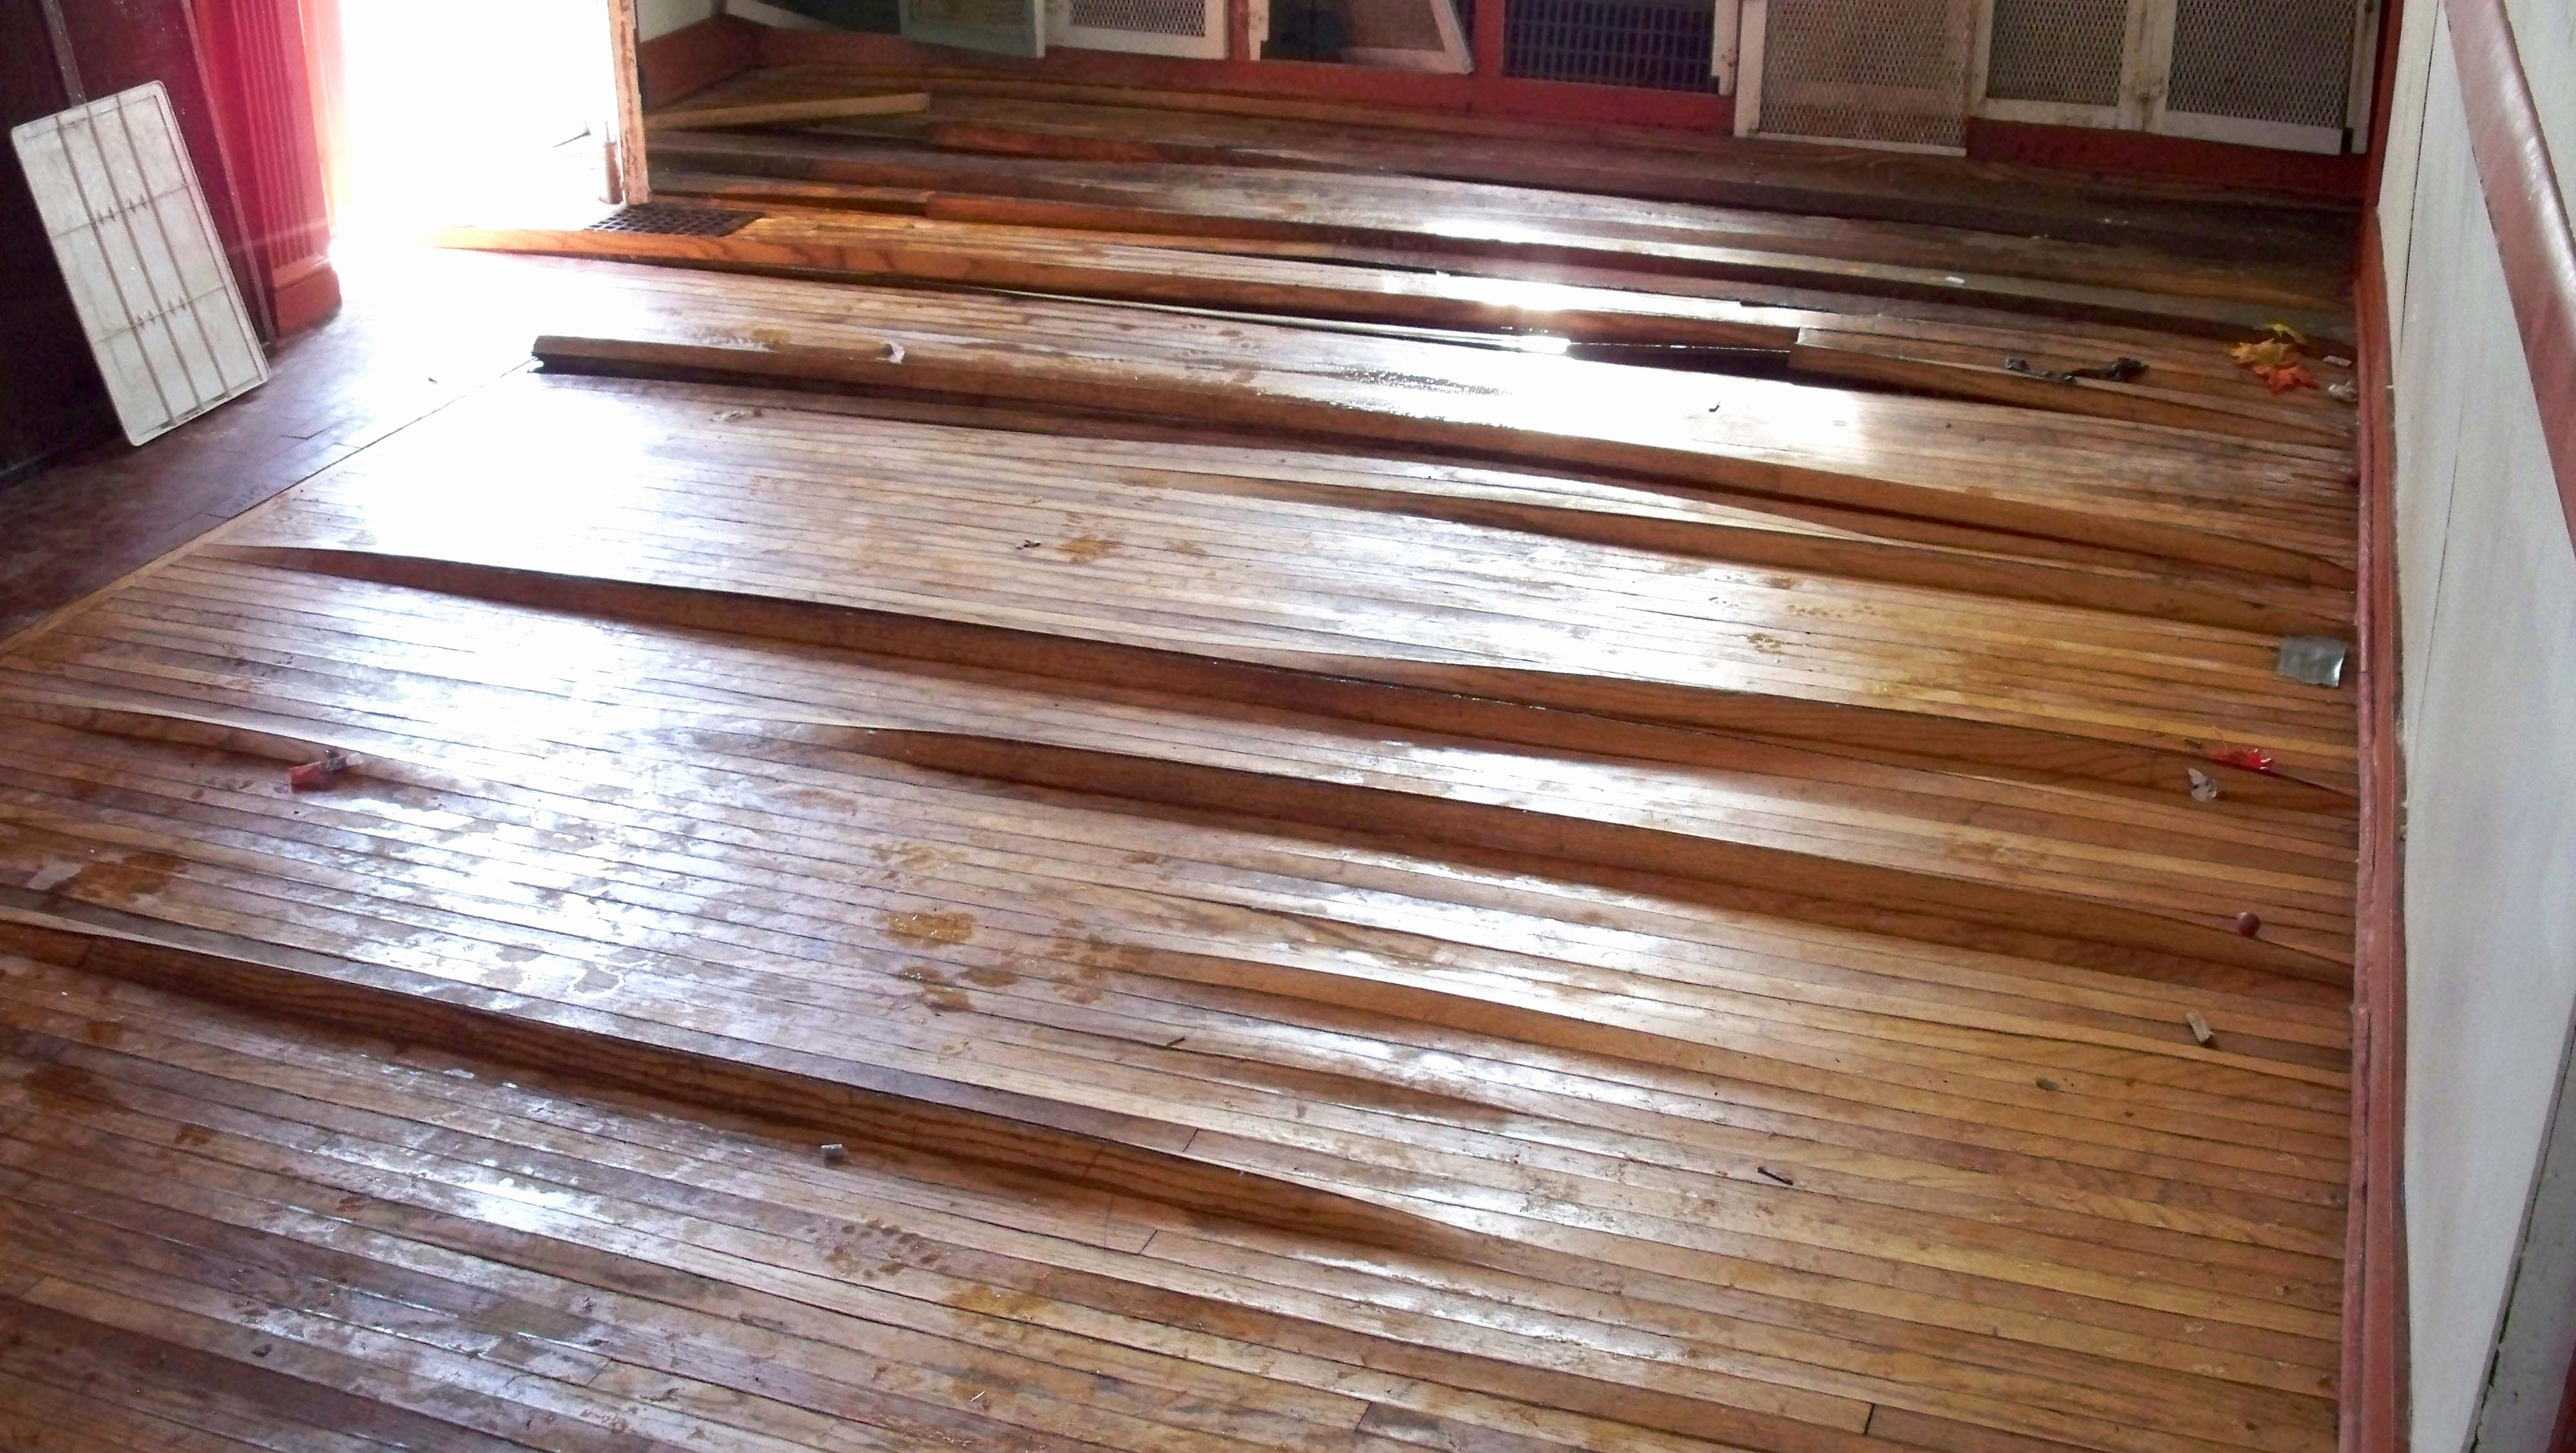 hardwood floor installation fort worth tx of floor wlcu with repair water damaged wood floor picture of hardwood floor water damage warping hardwood floors